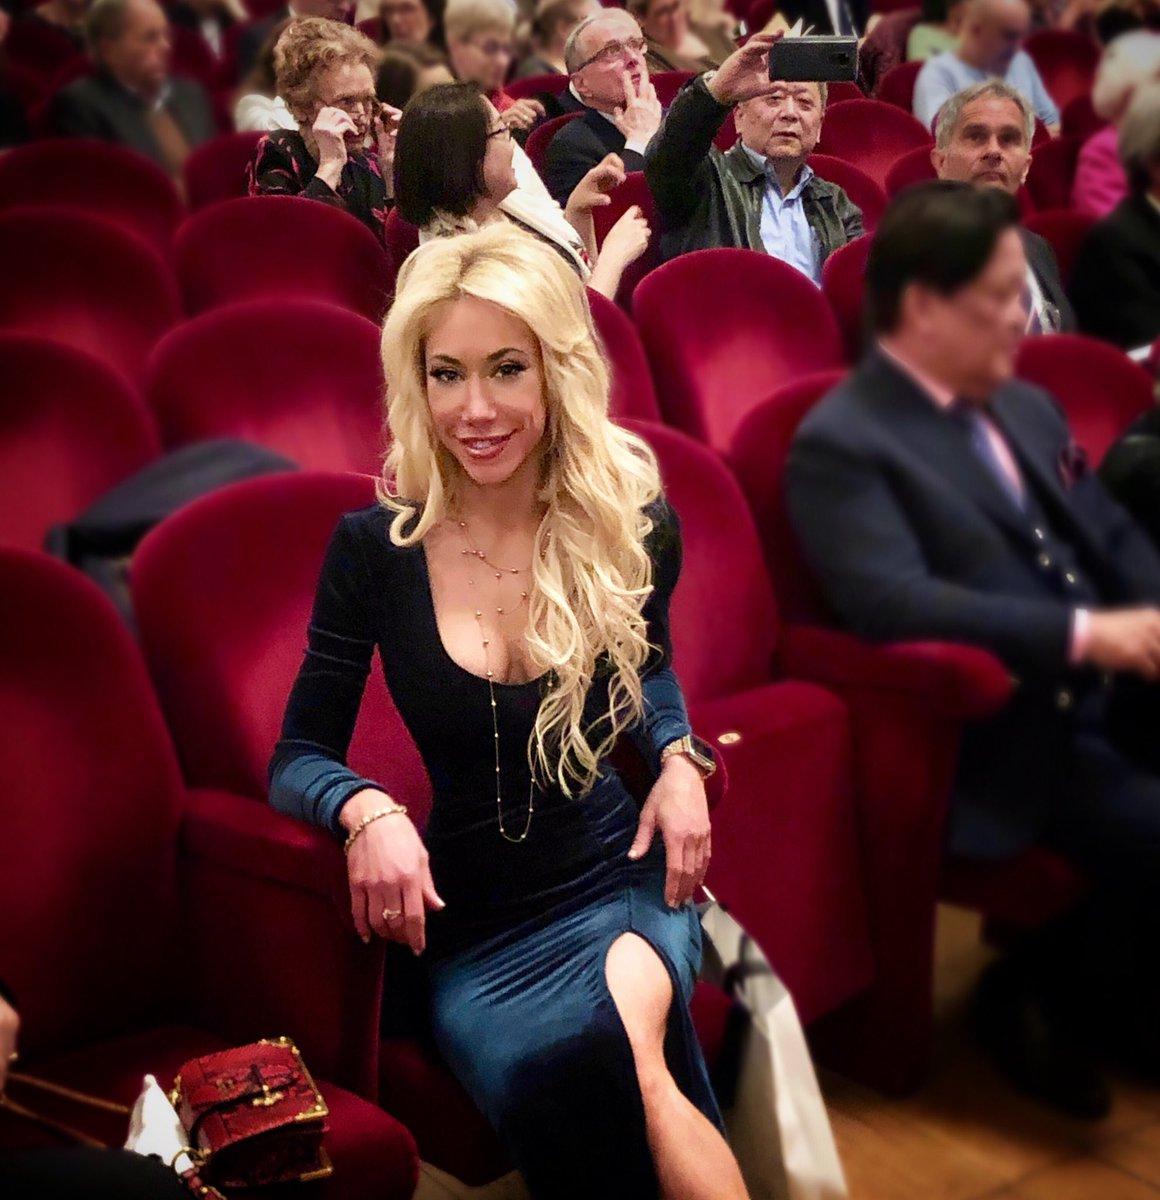 Had I not been at Milan's legendary #LaScalla, I may have thought I was being photobomb punked  #epicphotobombs #milan #italy #eurotour @teatroallascala #amazingnight #music #art #theatre #historical #italiannightout #femaleartist #velvetdresspic.twitter.com/GlRhJz90vk